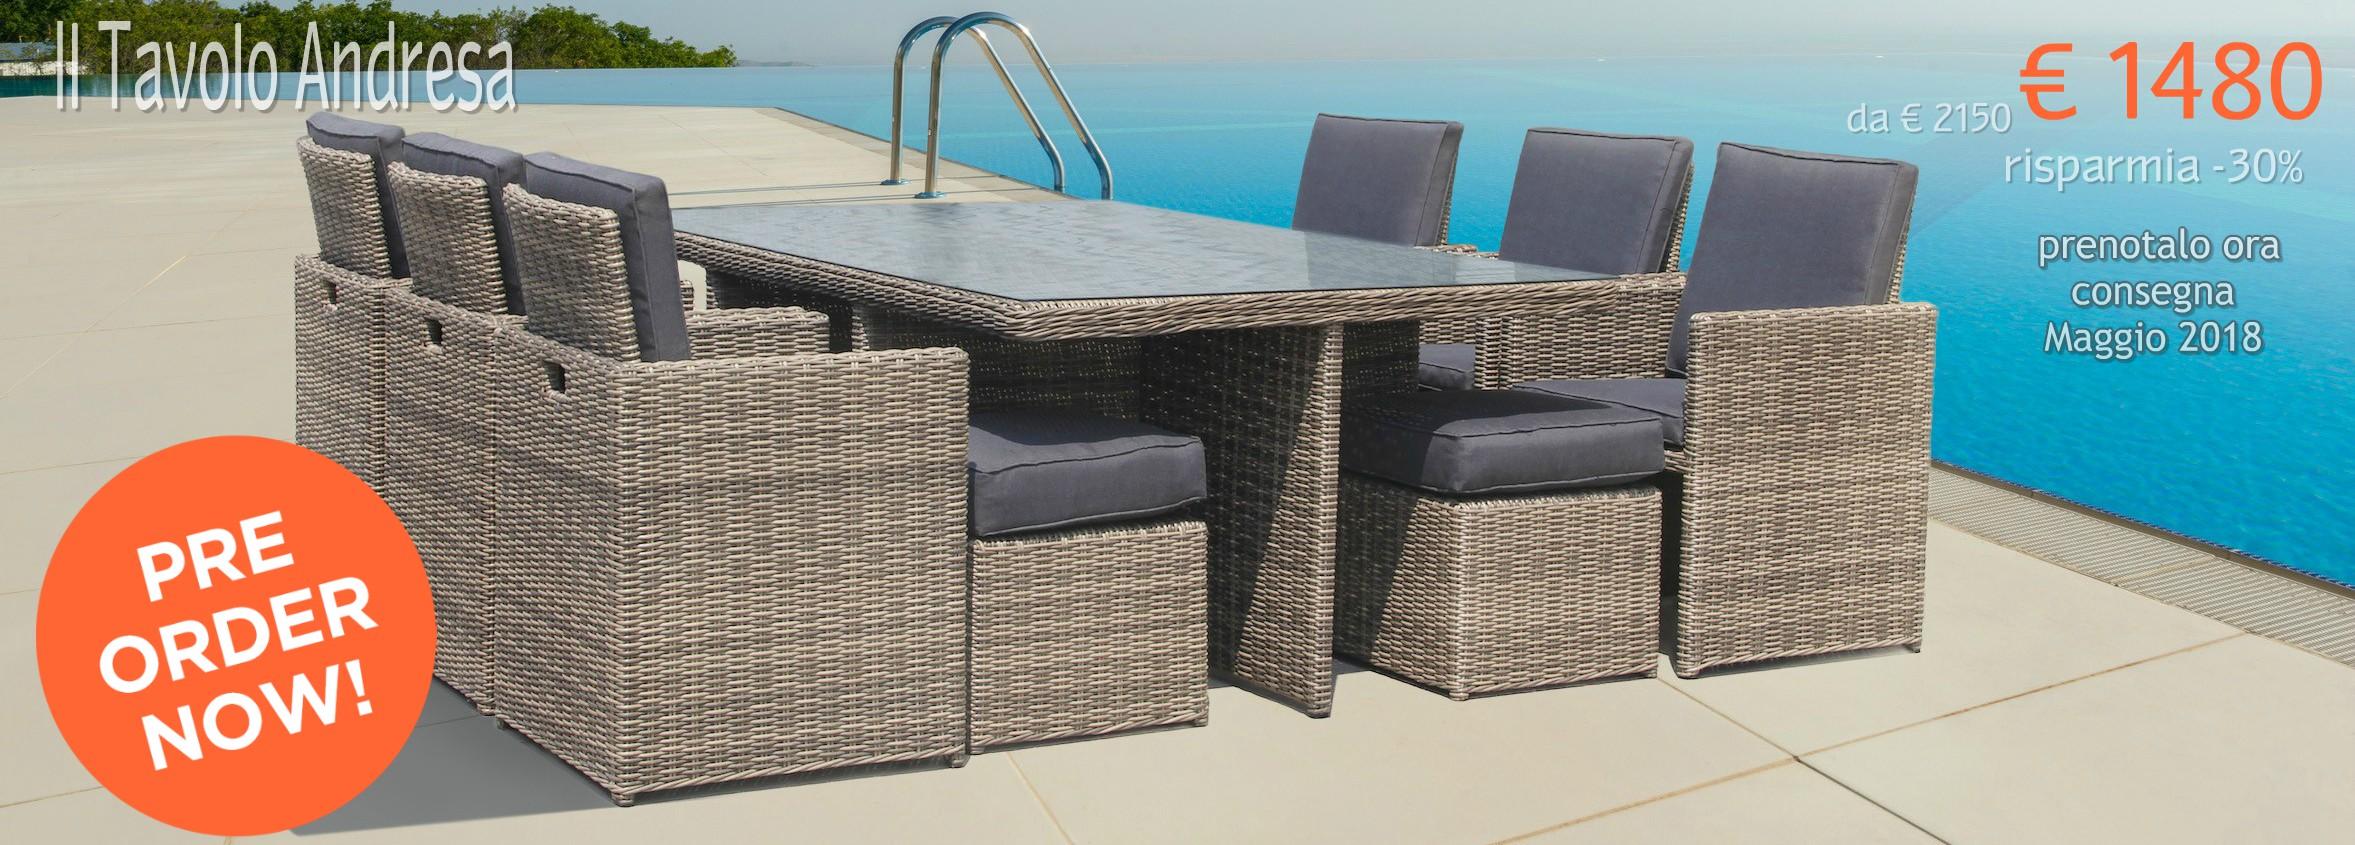 Arredo giardino on line mobili da esterno online for Arredo giardino on line